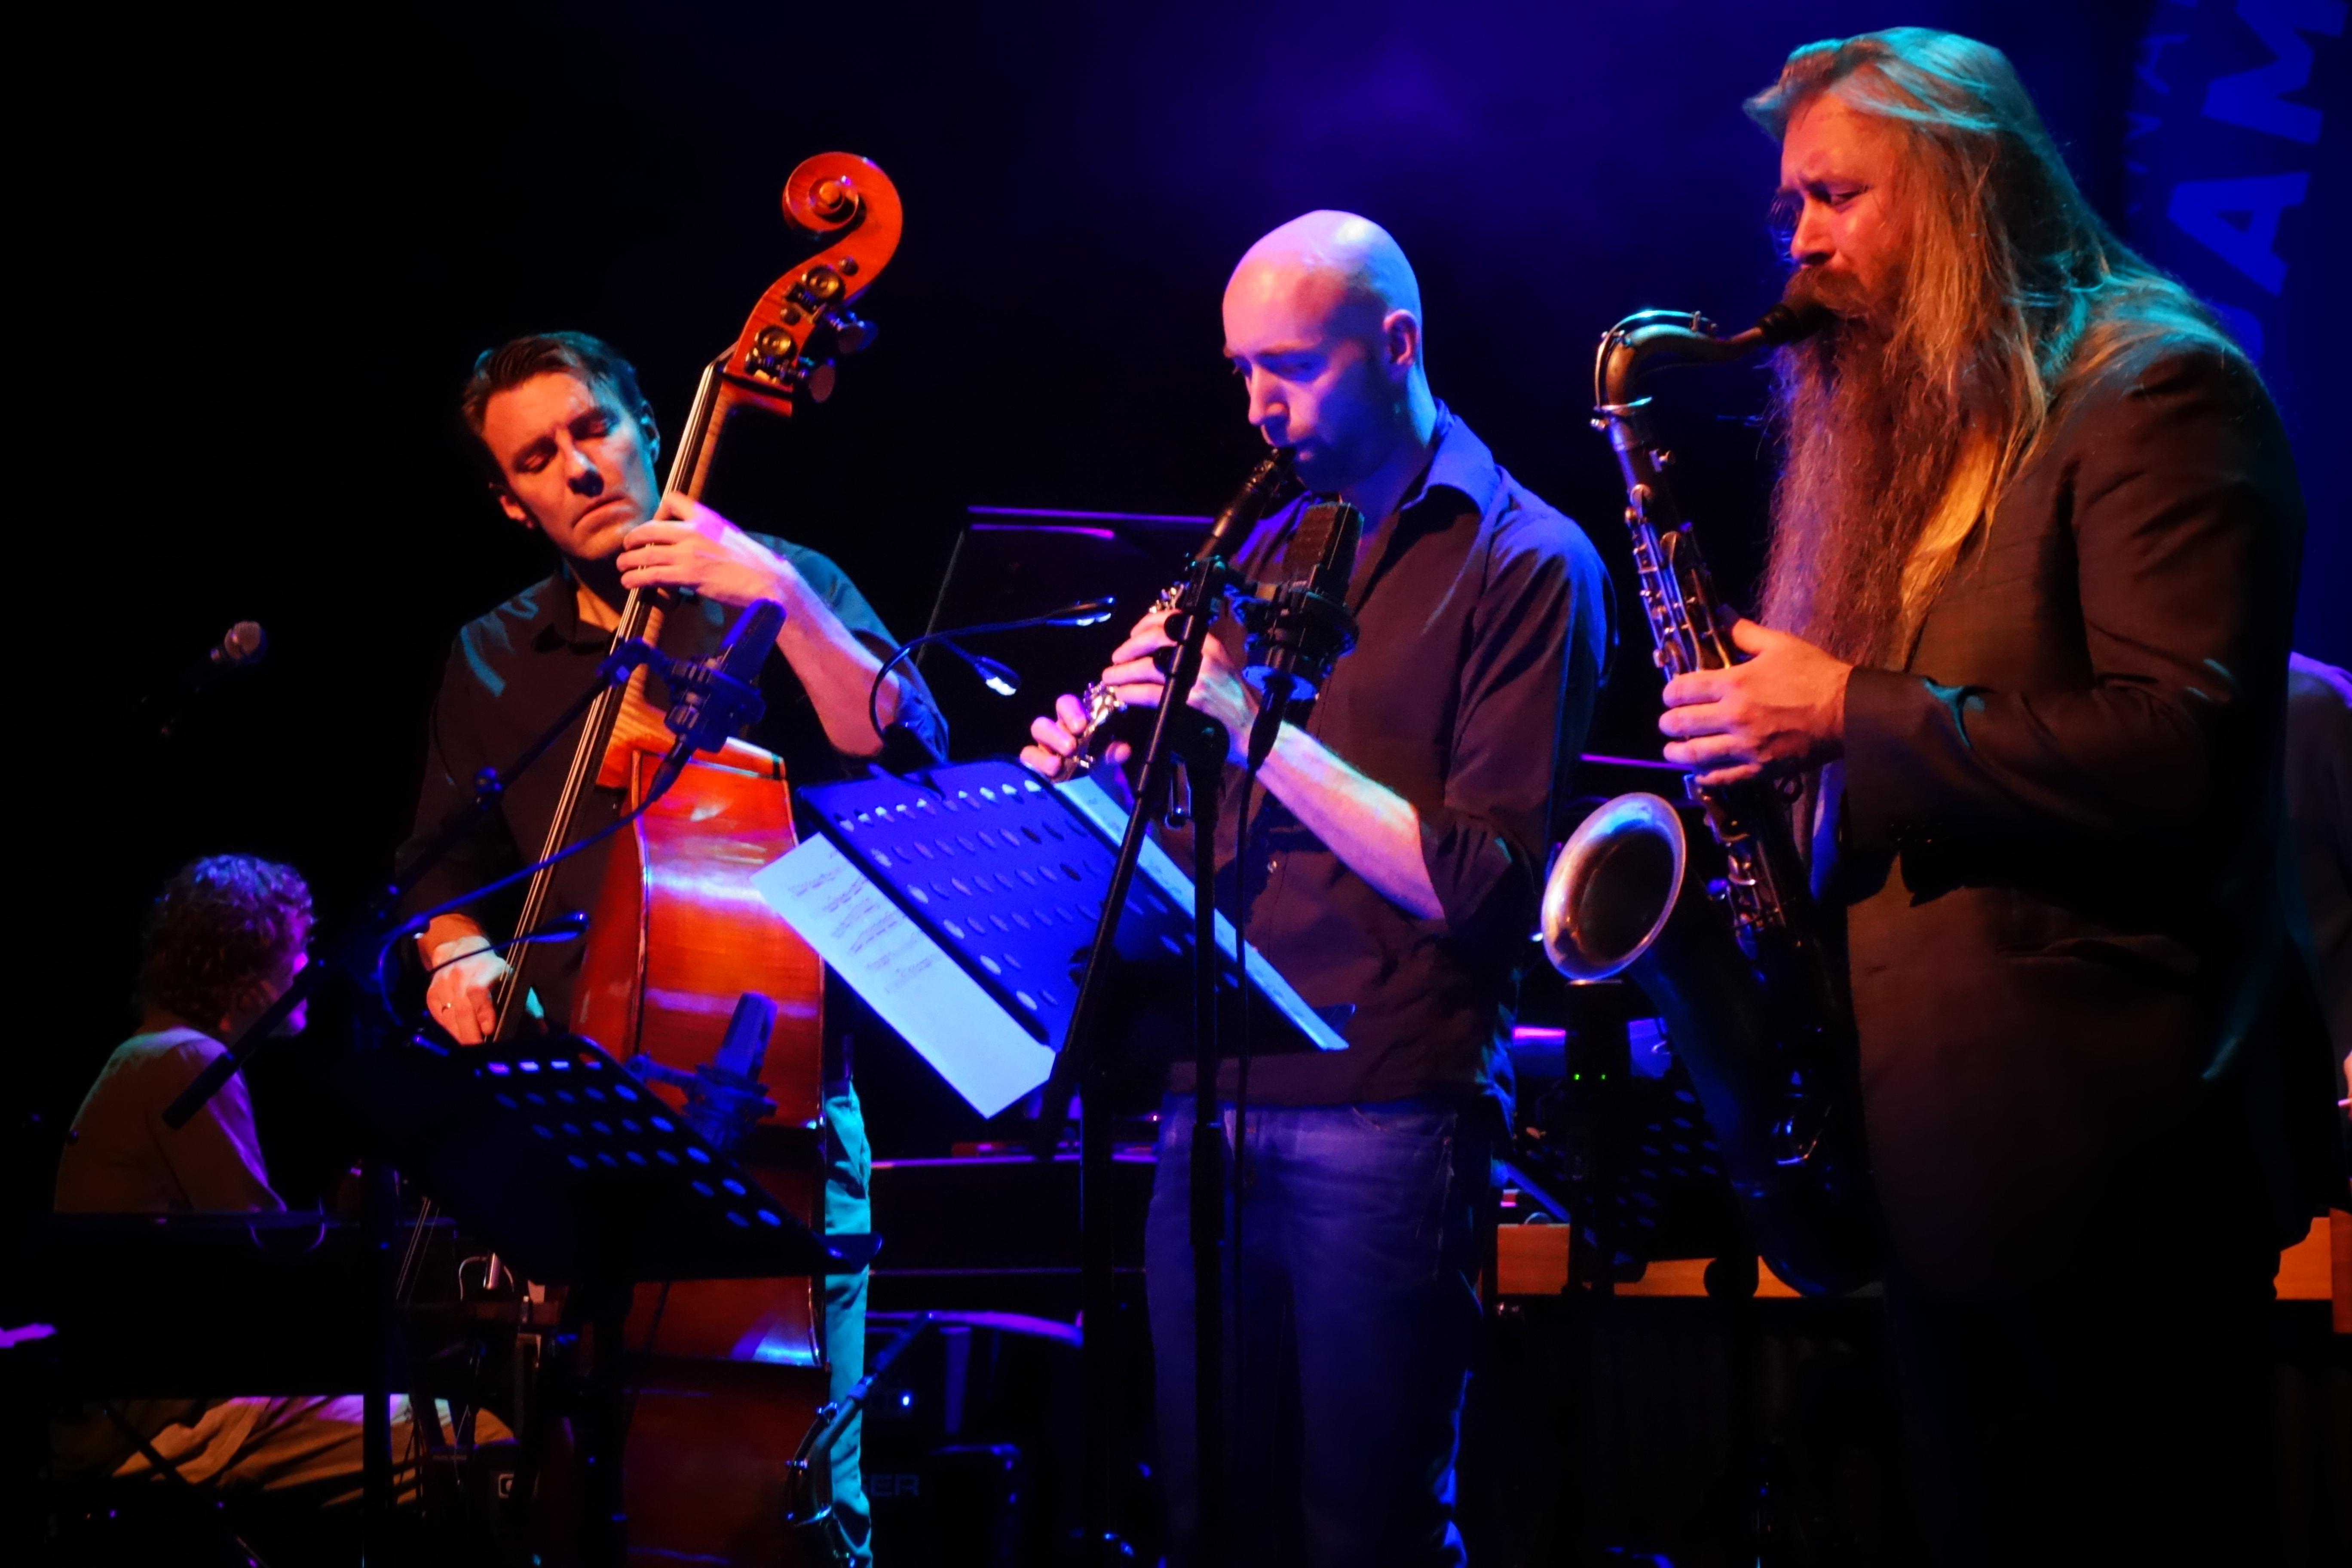 Mats Eilertsen, Eirik Hegdal, Trygve - Seim Rotterdam Jazz International Festival